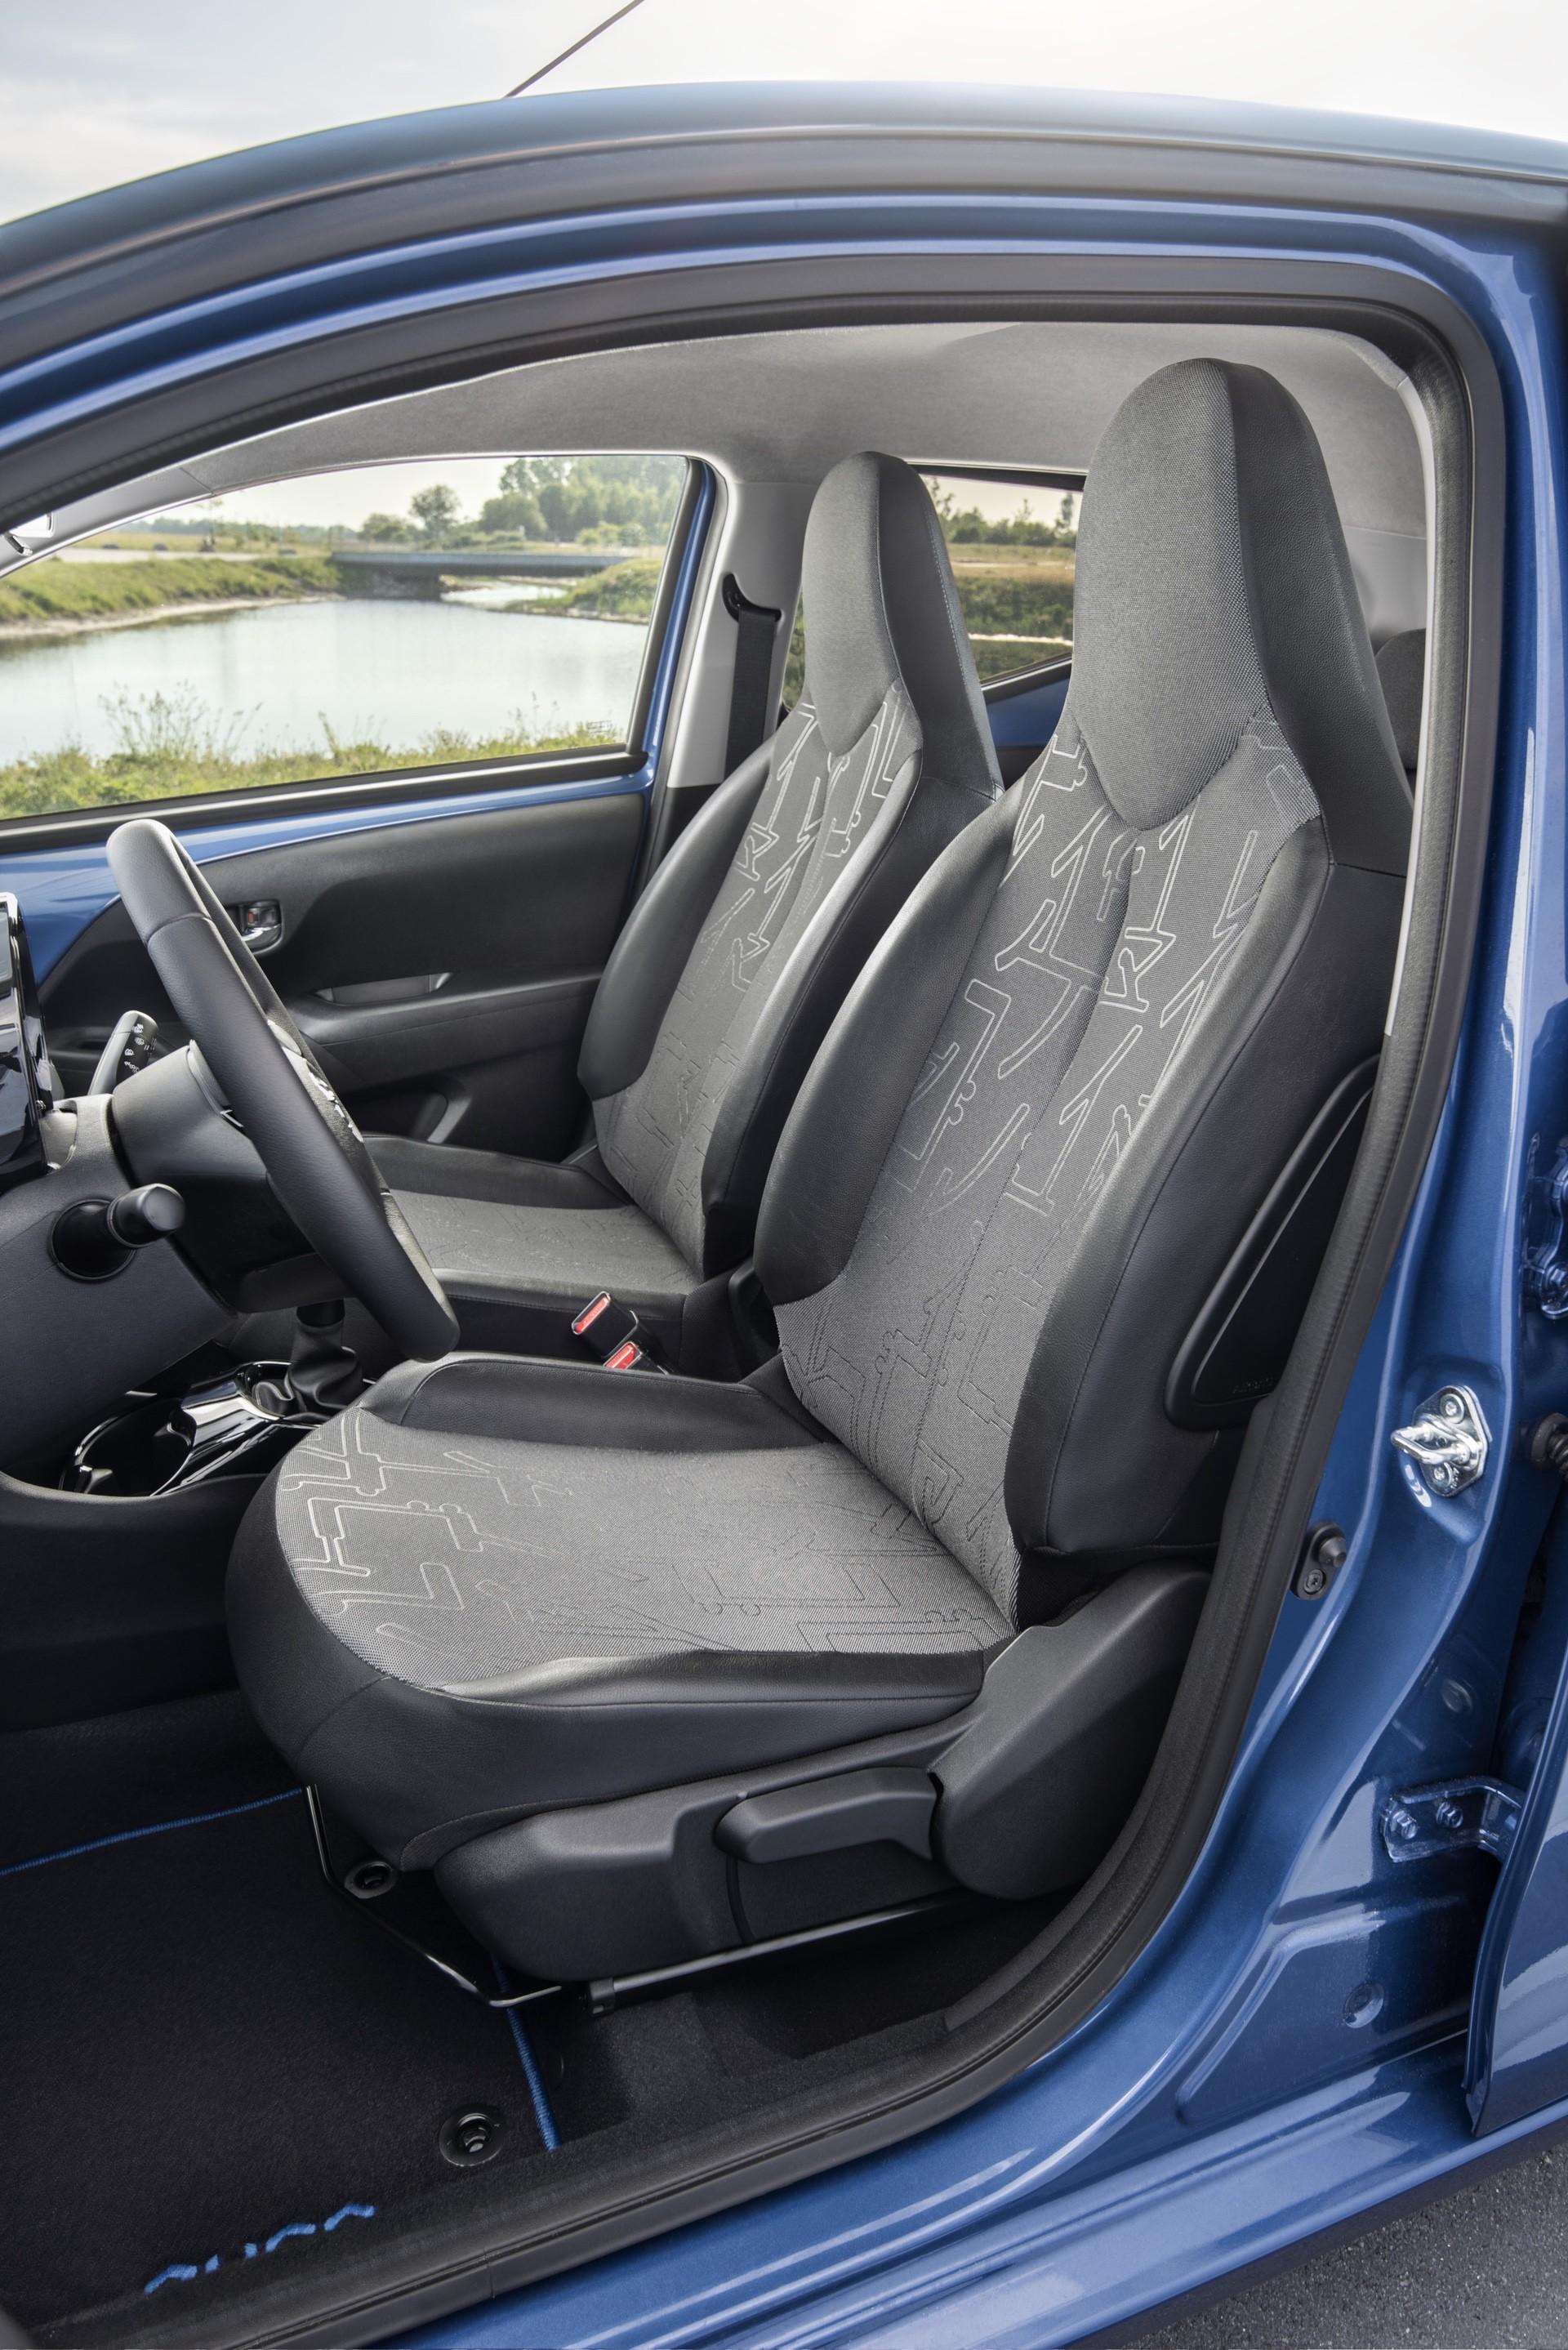 Toyota_Aygo_facelift_presskit_0037